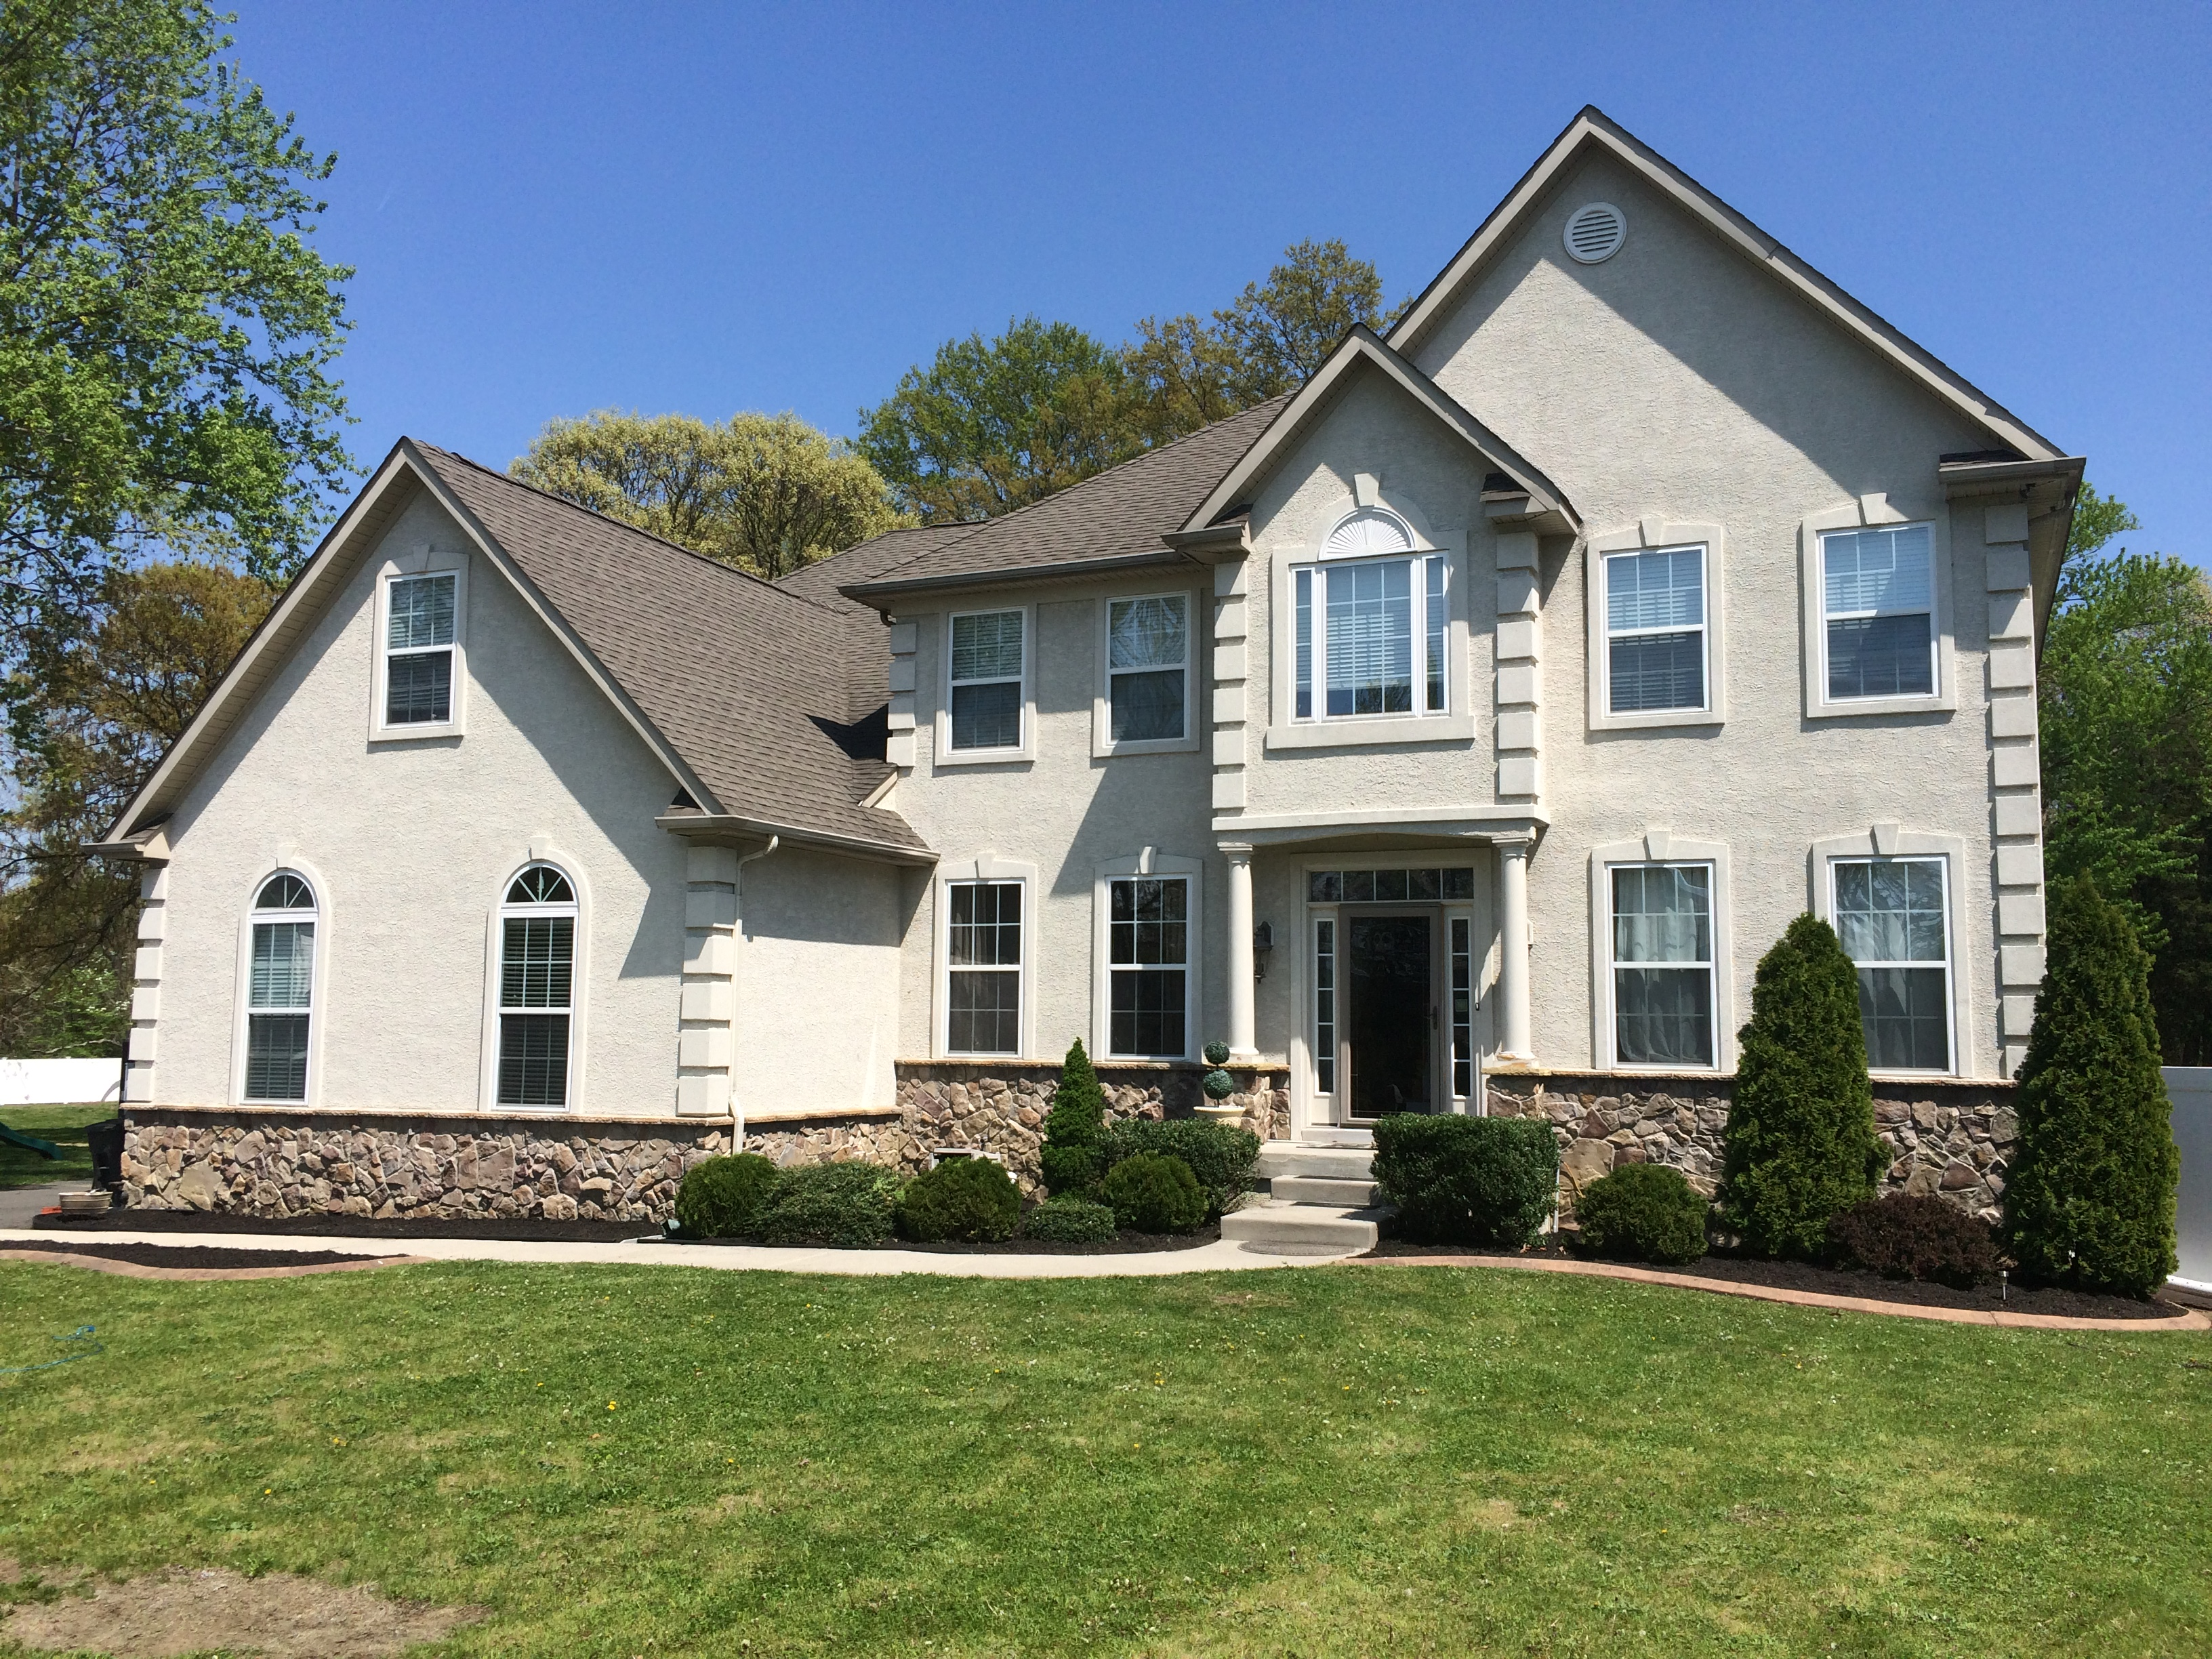 246 Sickle Ln, Woodbury, New Jersey 08096